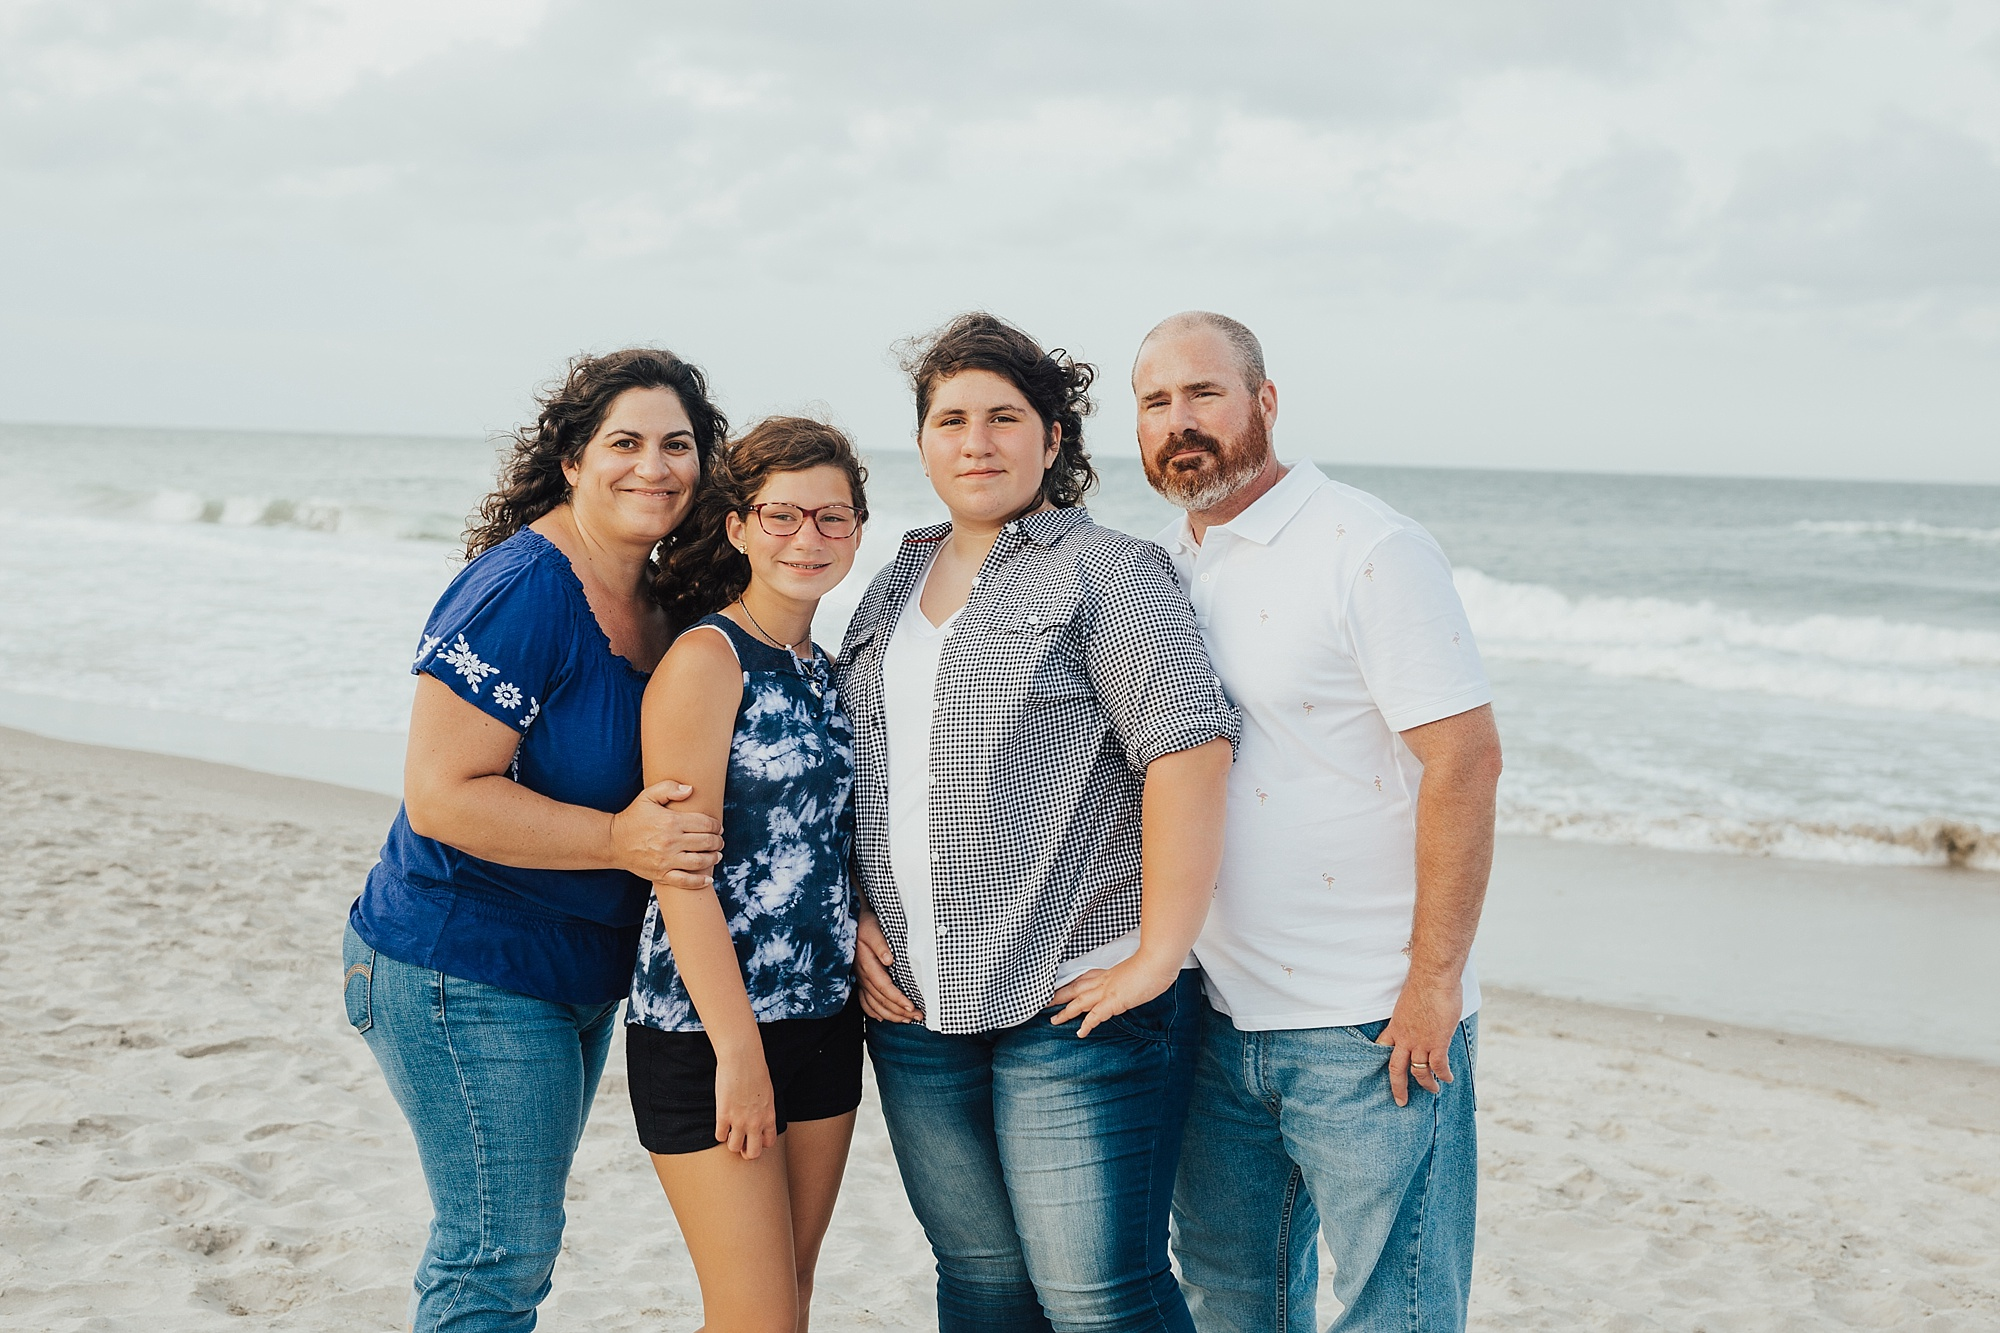 Joe_Mac_Creative_Beach_Family_Photography_OBX_Corolla__0038.jpg